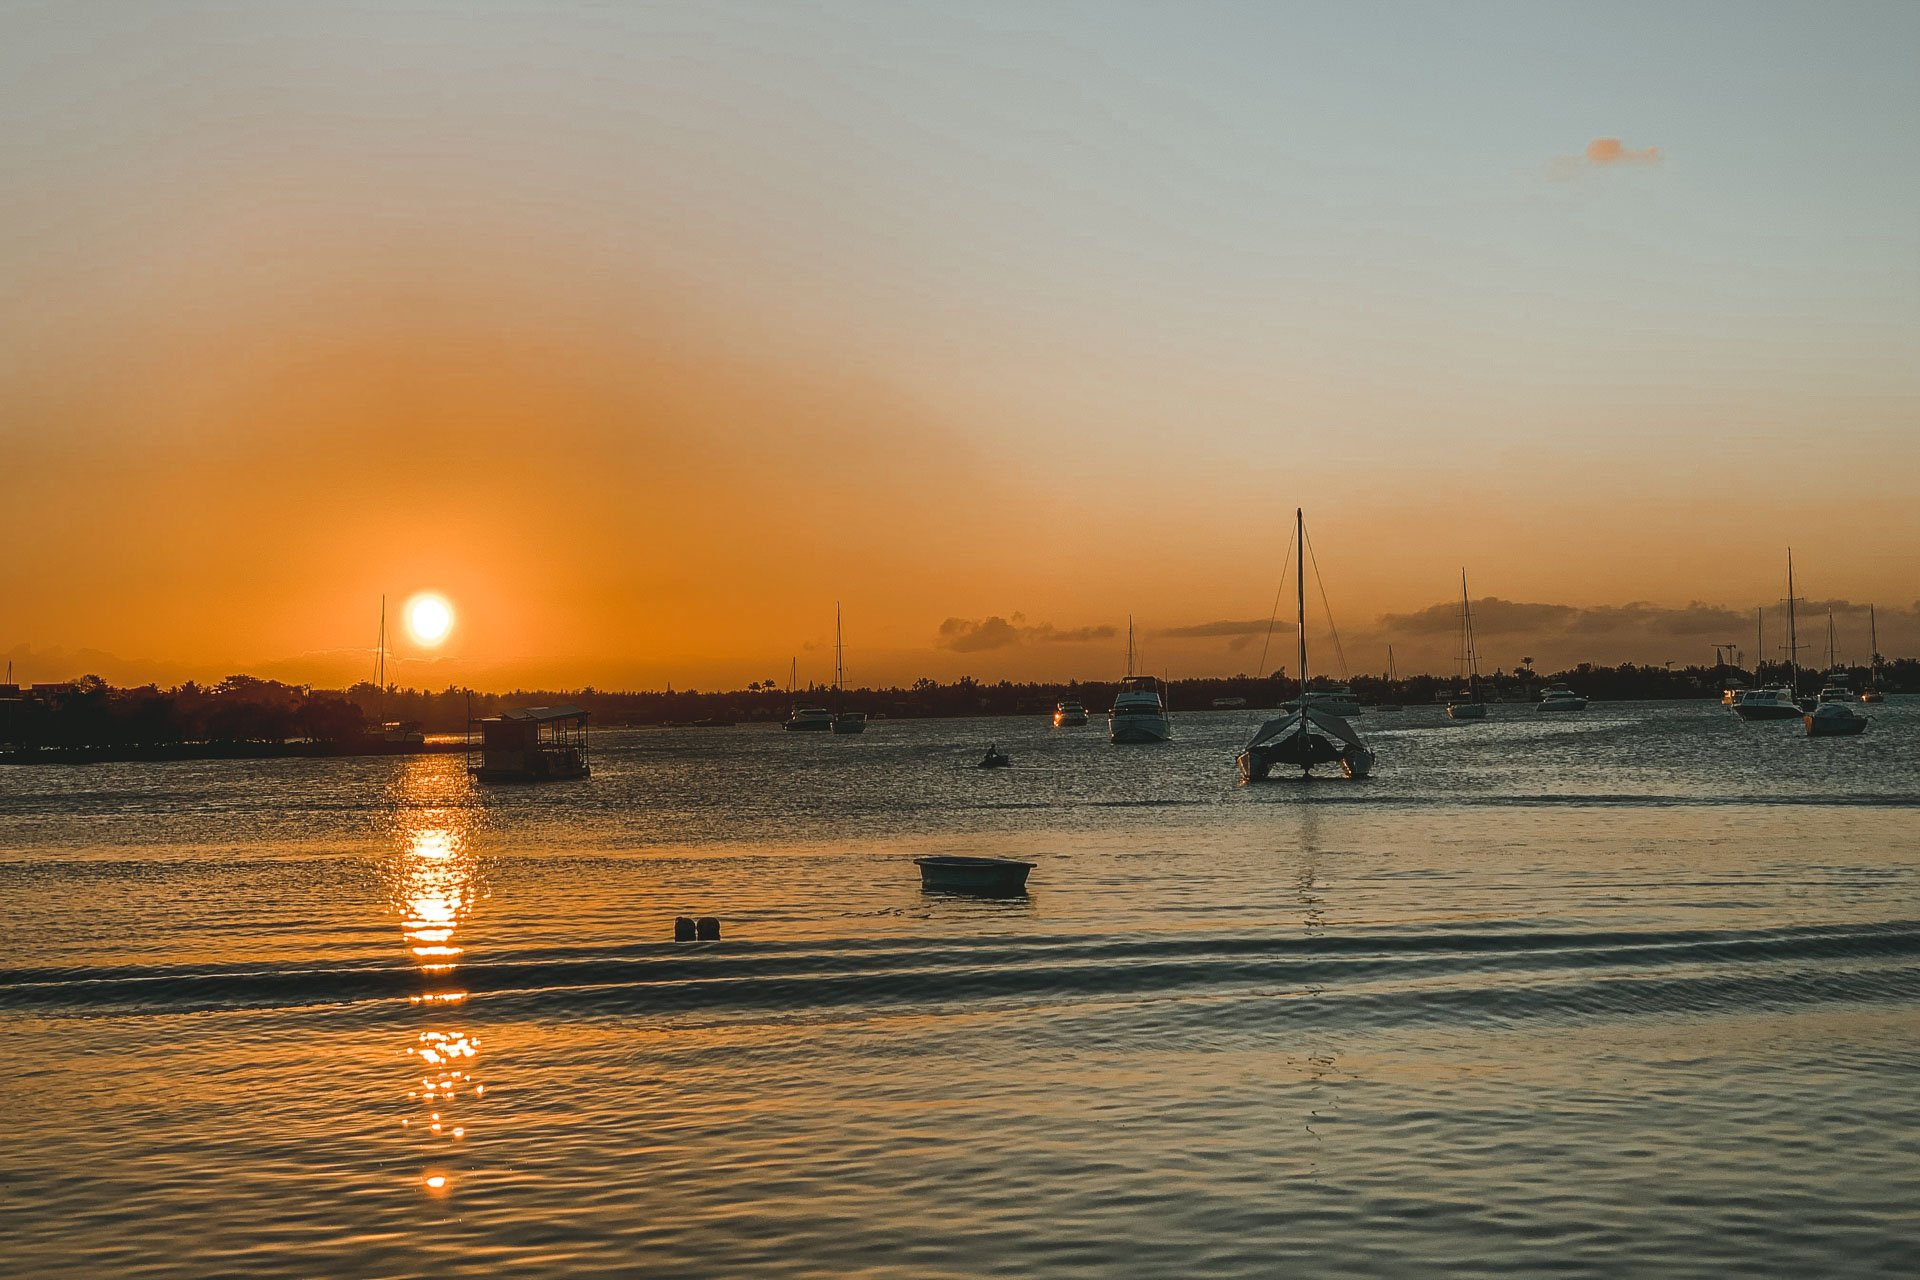 Grand Baie, Grand baie Mauritius, Mauritius island, Mauritius sunset